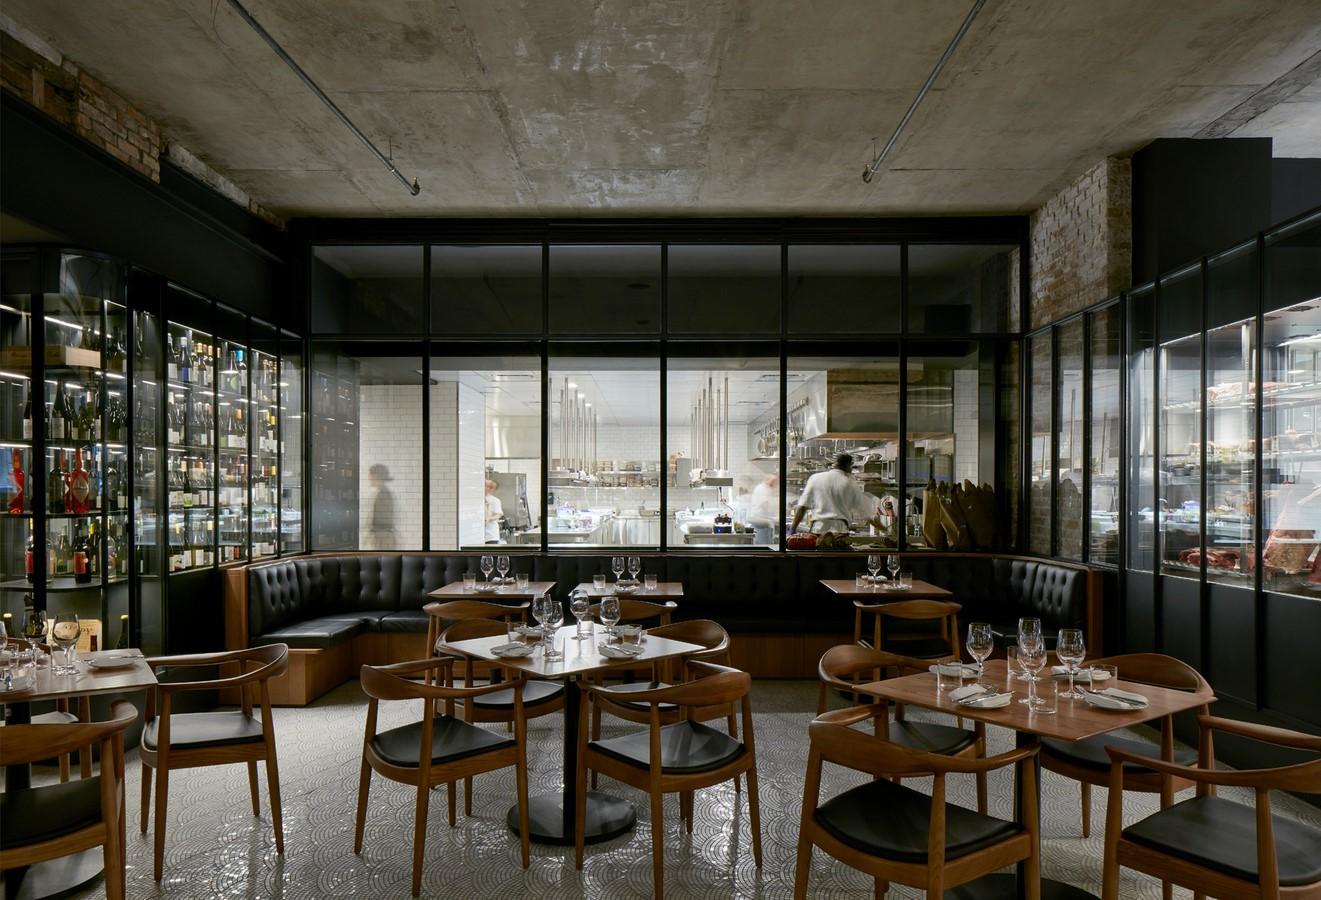 Le Monarque by Alain Carle Architecte Inc - Sheet2